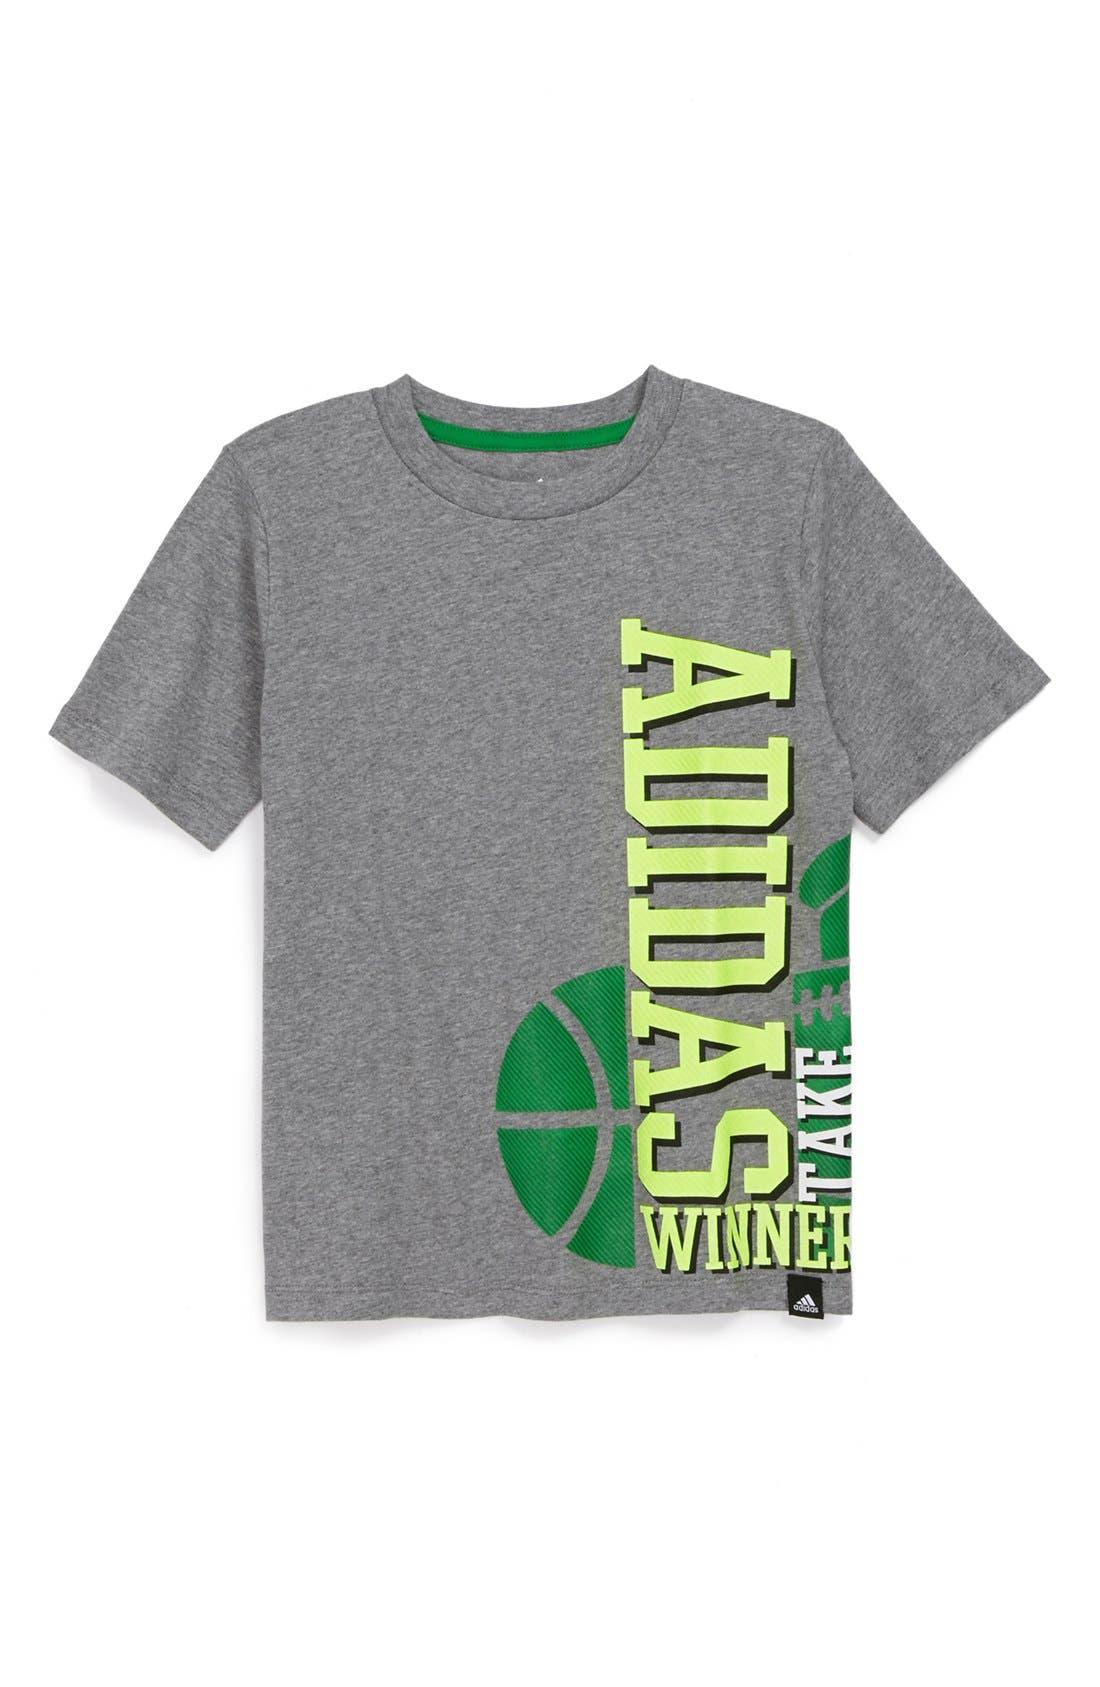 Alternate Image 1 Selected - adidas 'Train Hard Play Hard' T-Shirt (Little Boys)